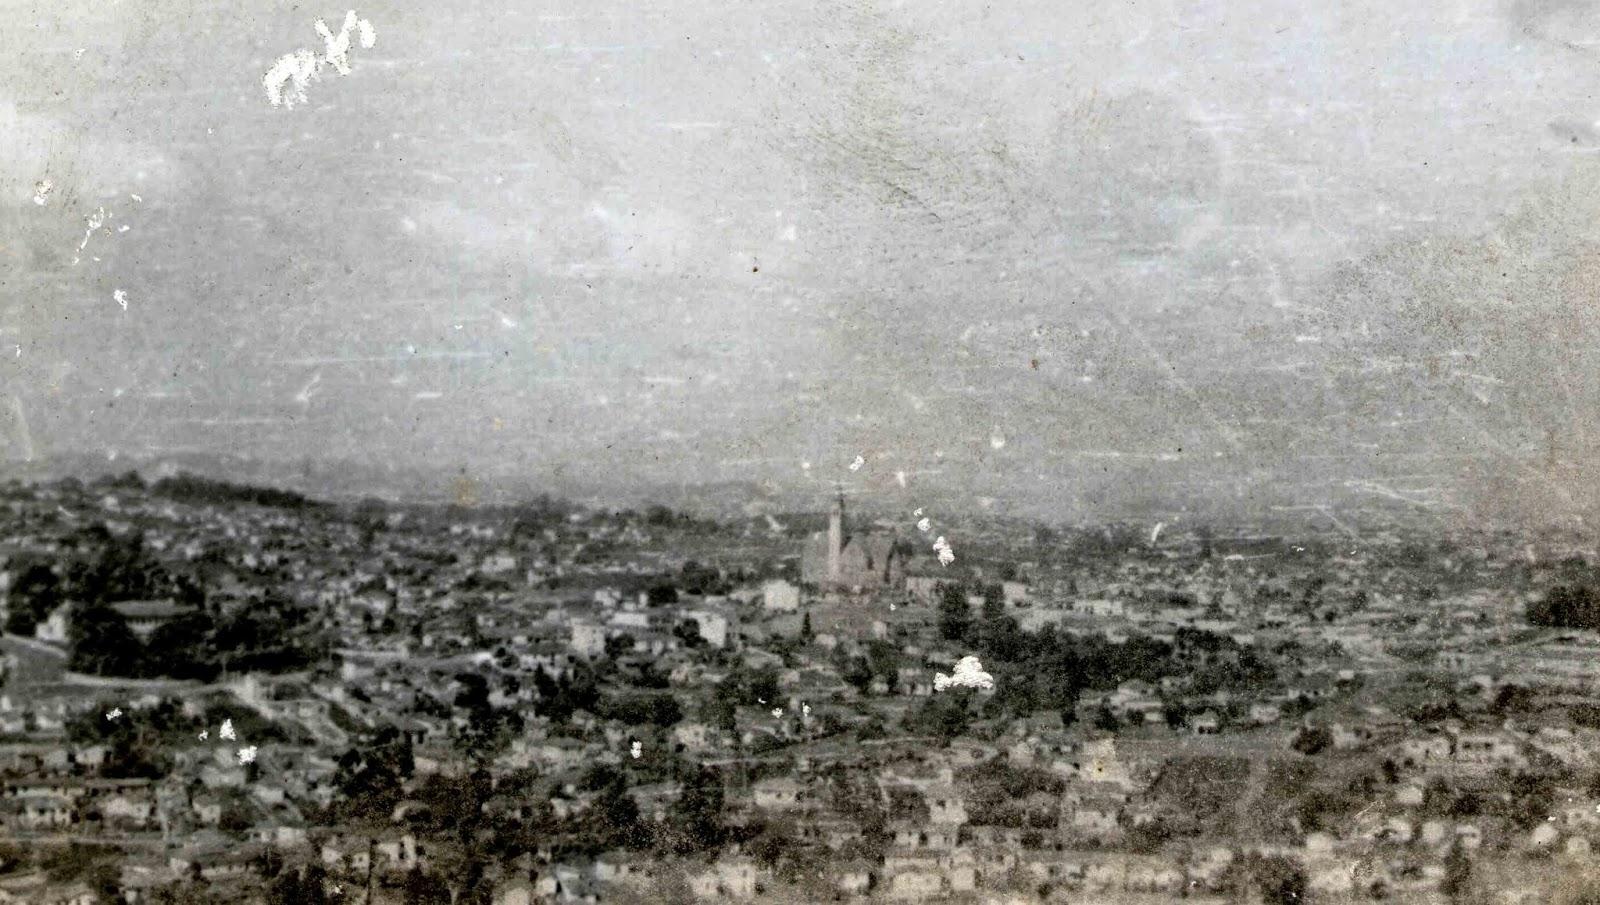 Vila Santa Isabel, Zona Leste de São Paulo, bairros de São Paulo, história de São Paulo, Vila Formosa, Benedito Calixto Neto, Basílica de Aparecida